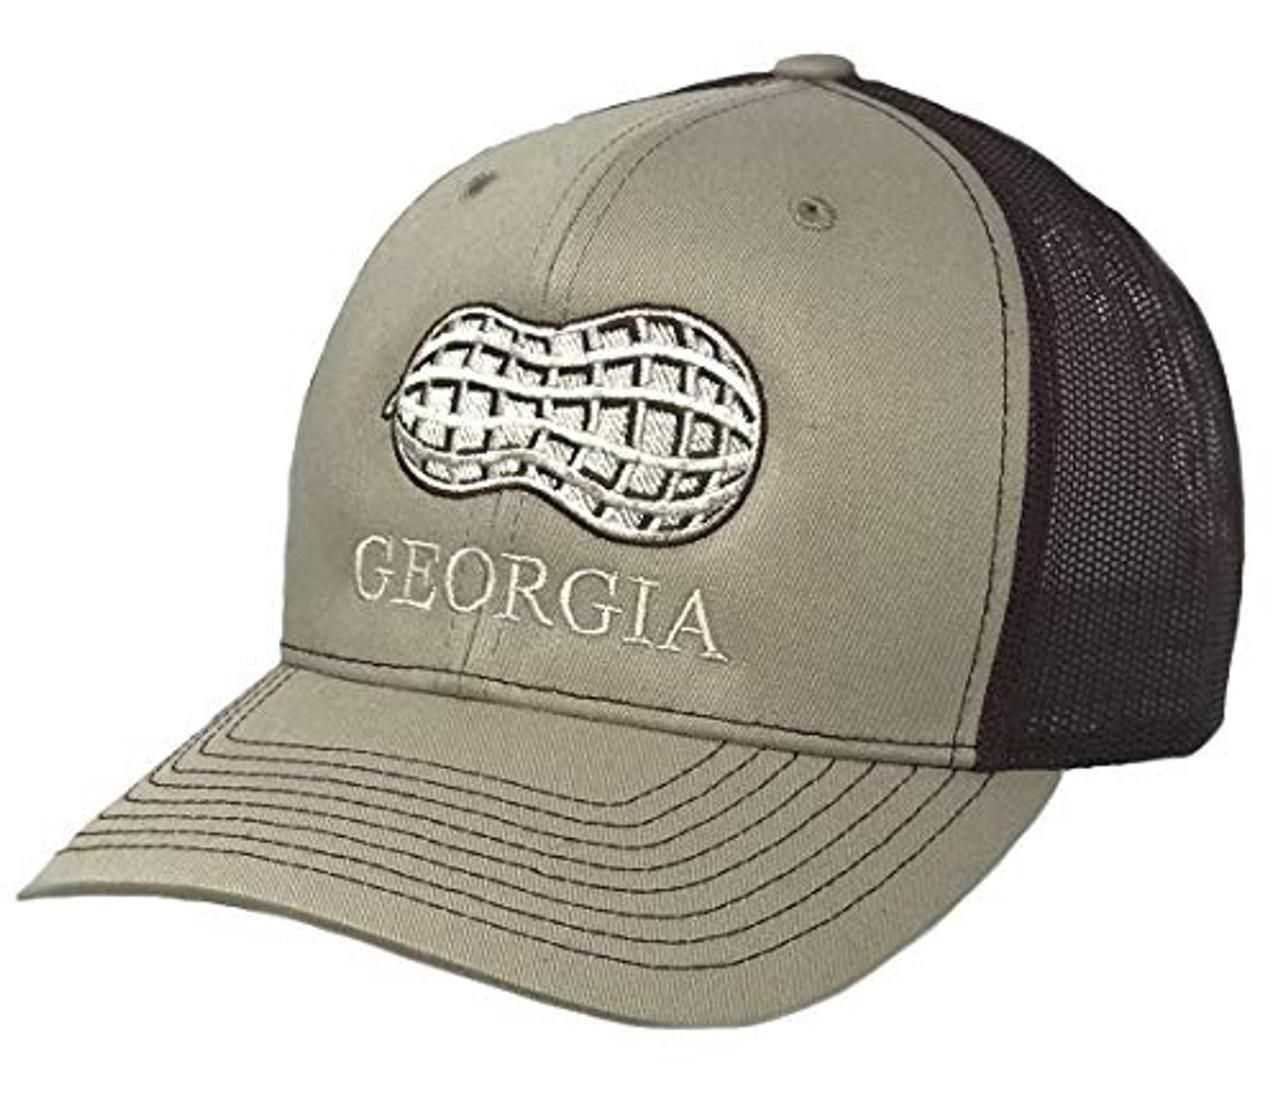 bdc9bdc02df Heritage Pride Georgia Peanut Embroidered Trucker Hat-Khaki